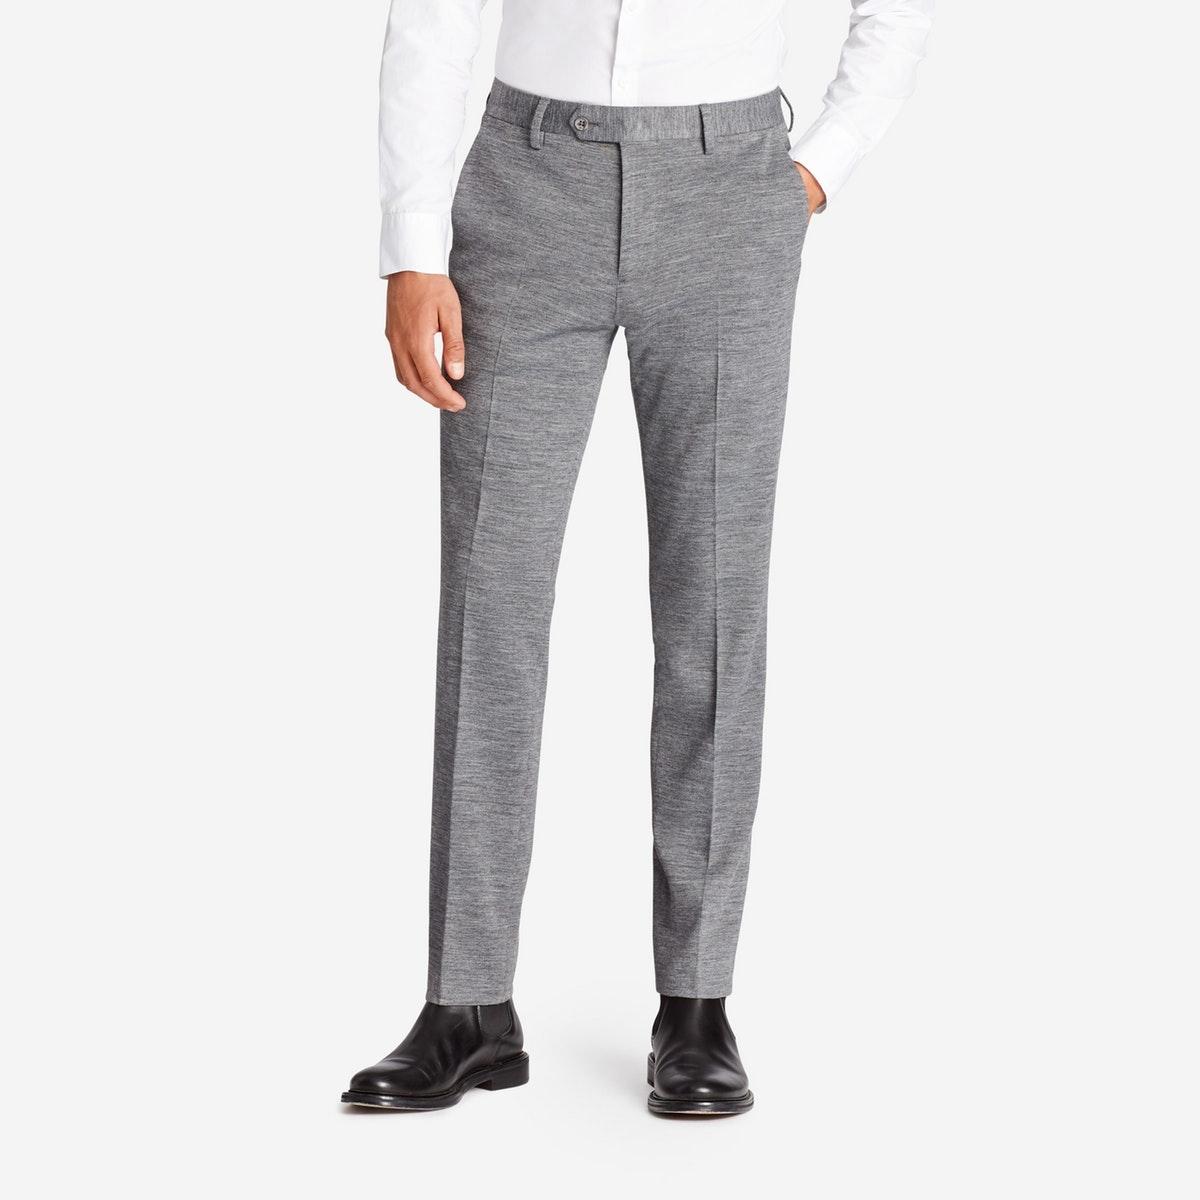 Jetsetter Stretch Italian Knit Suit Pant